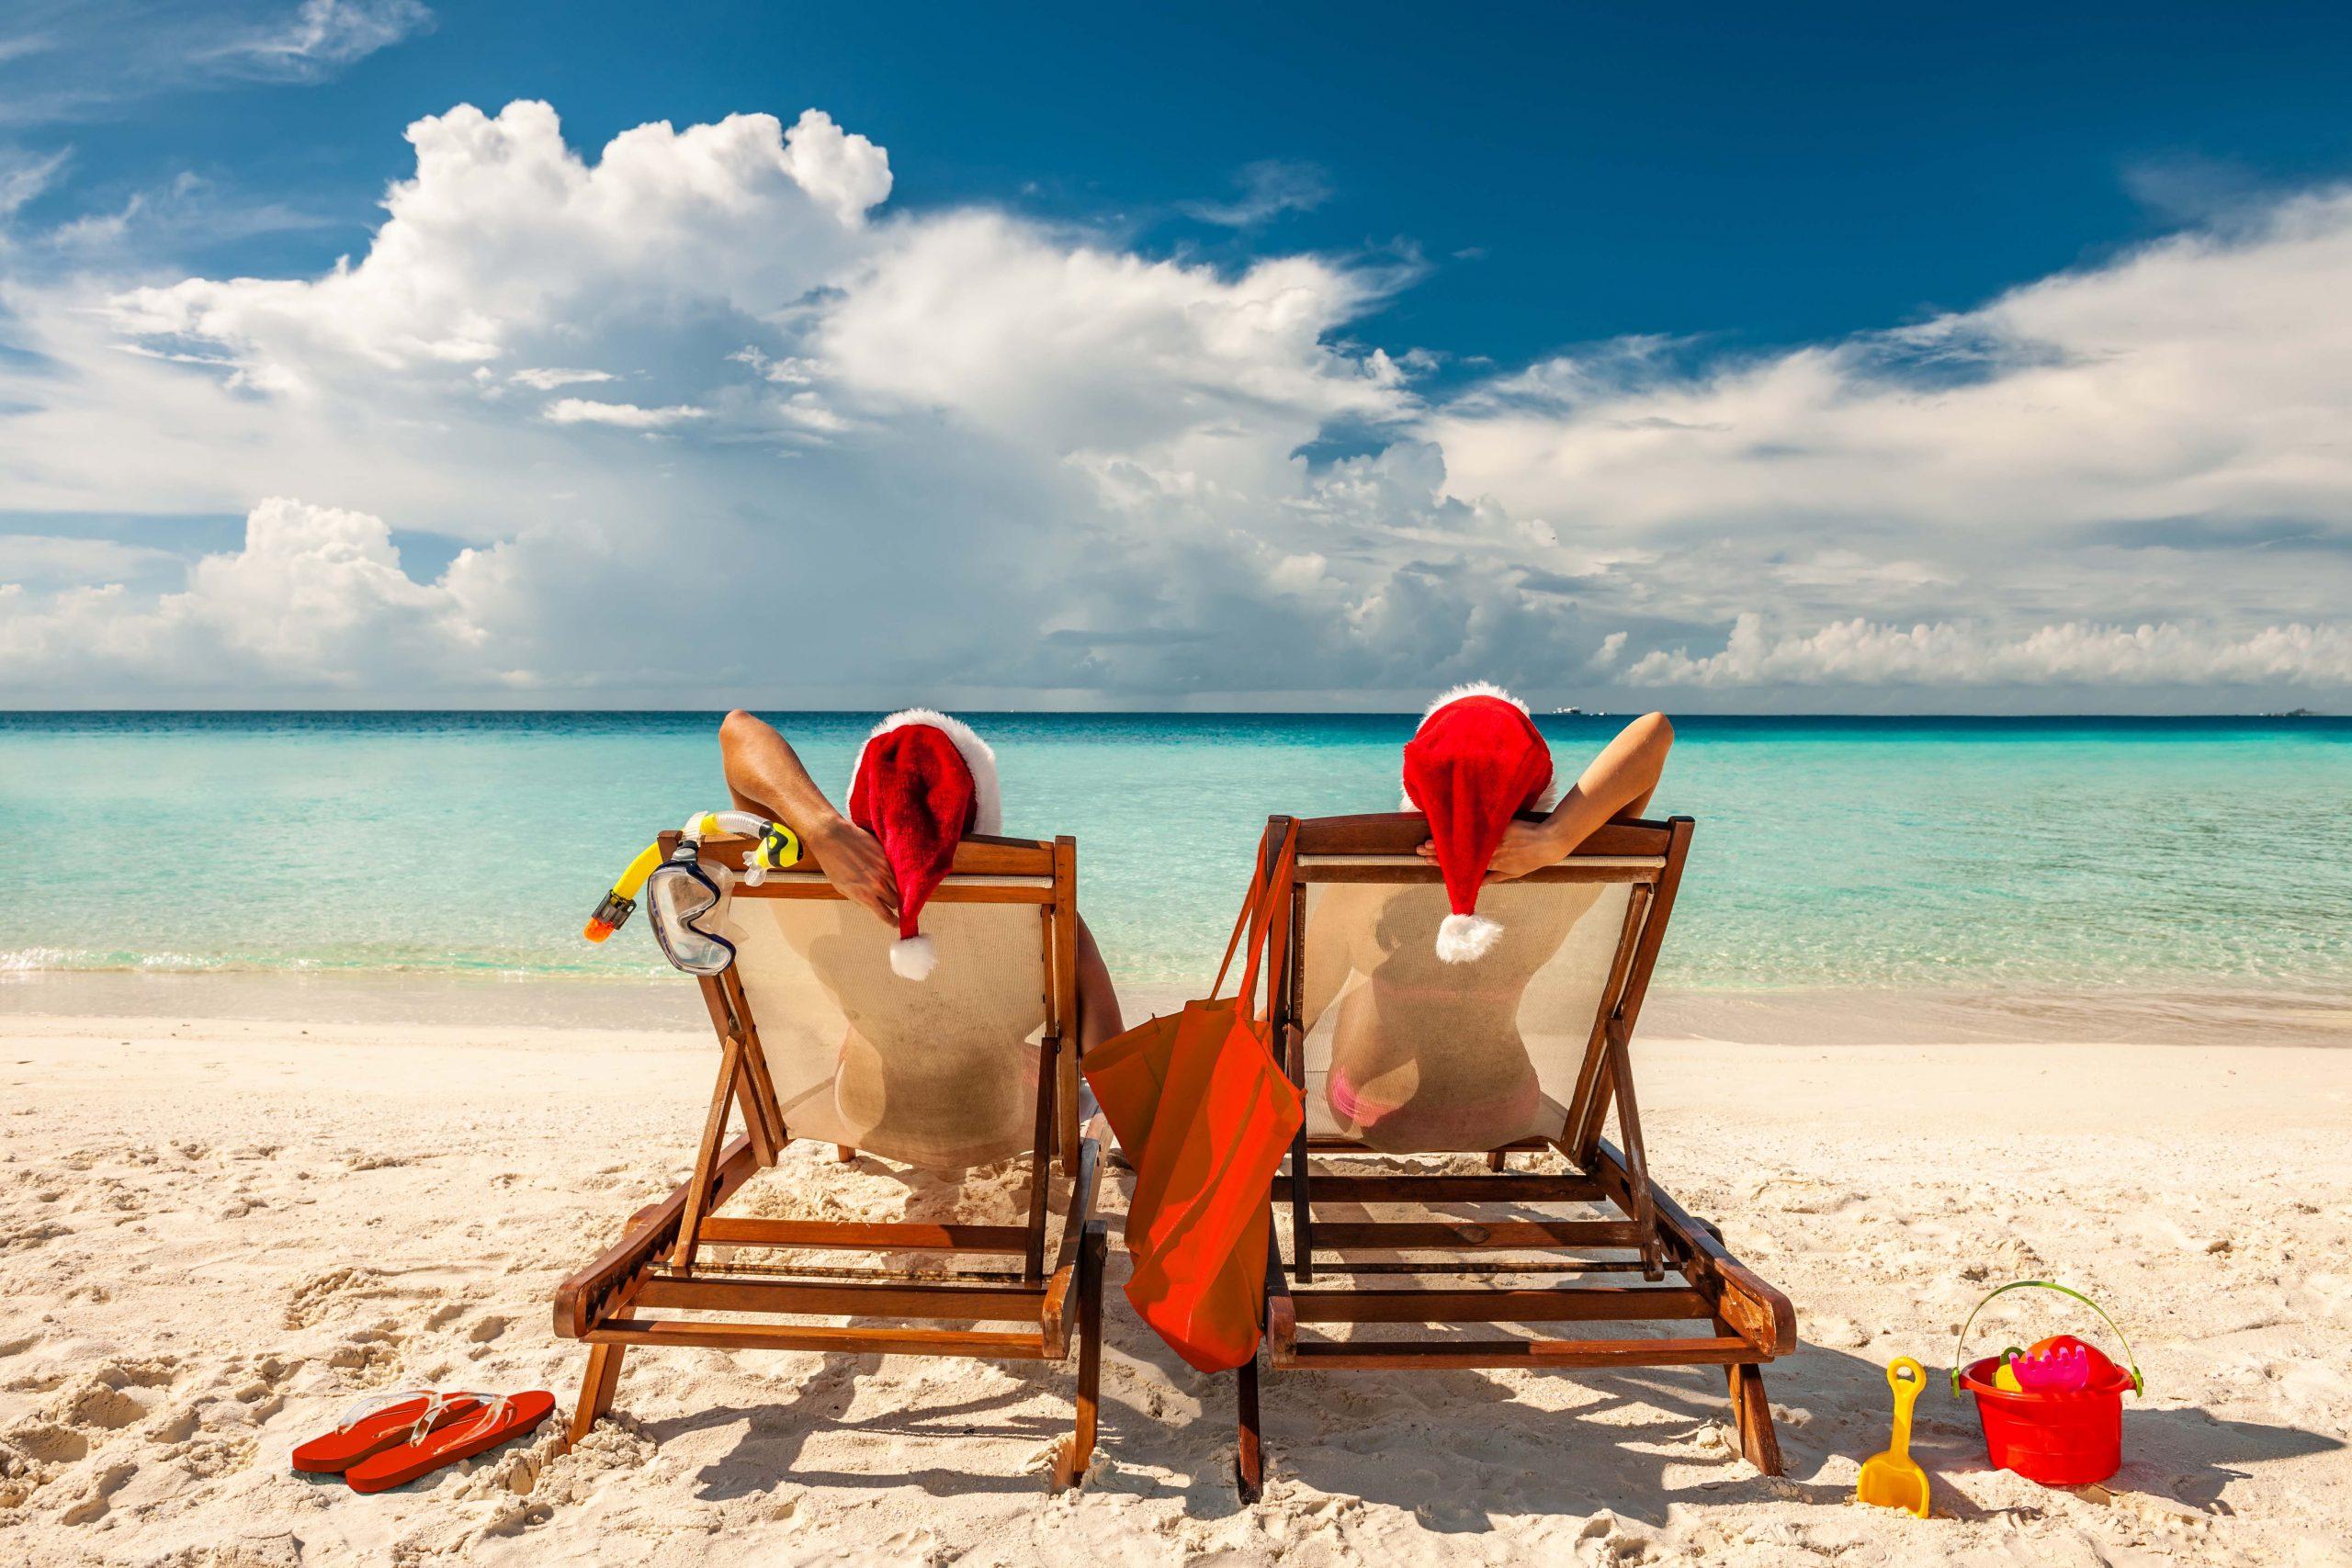 Hotel AMAAN BEACH BUNGALOW 3*, std 1/2+1, NZ,  Novoletni Zanzibar 10 dni